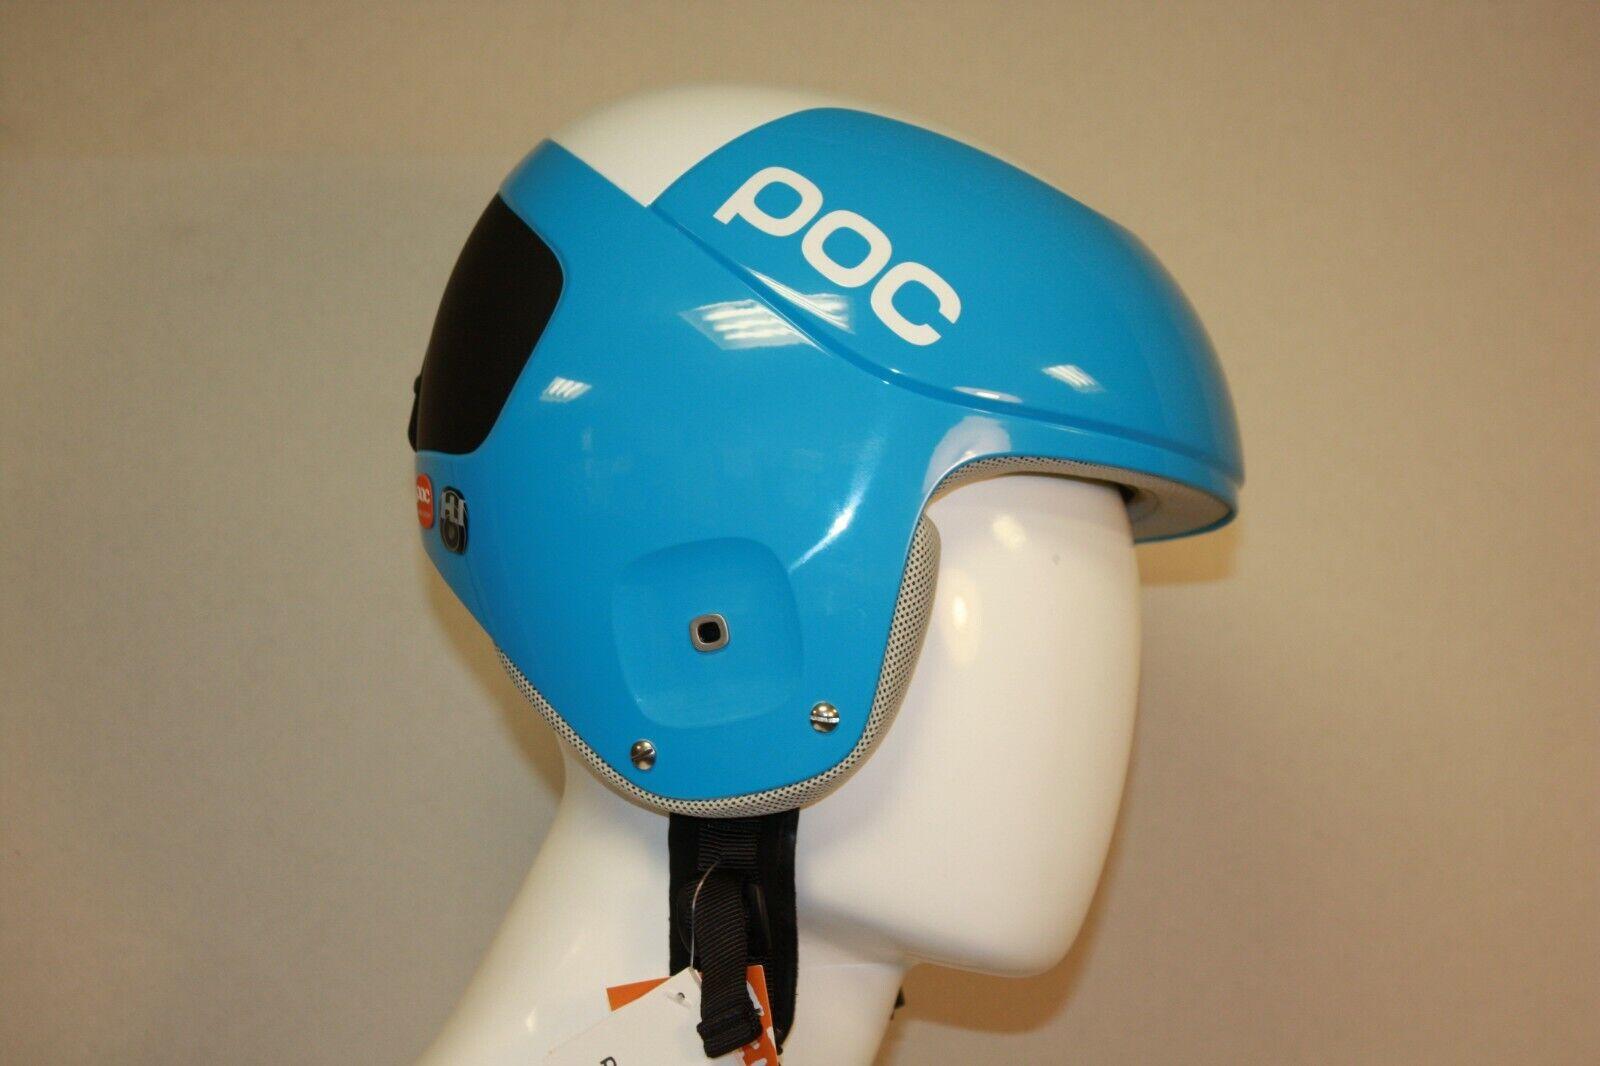 POC Skull Orbic Comp H.I MIPS - Radon bluee - M L